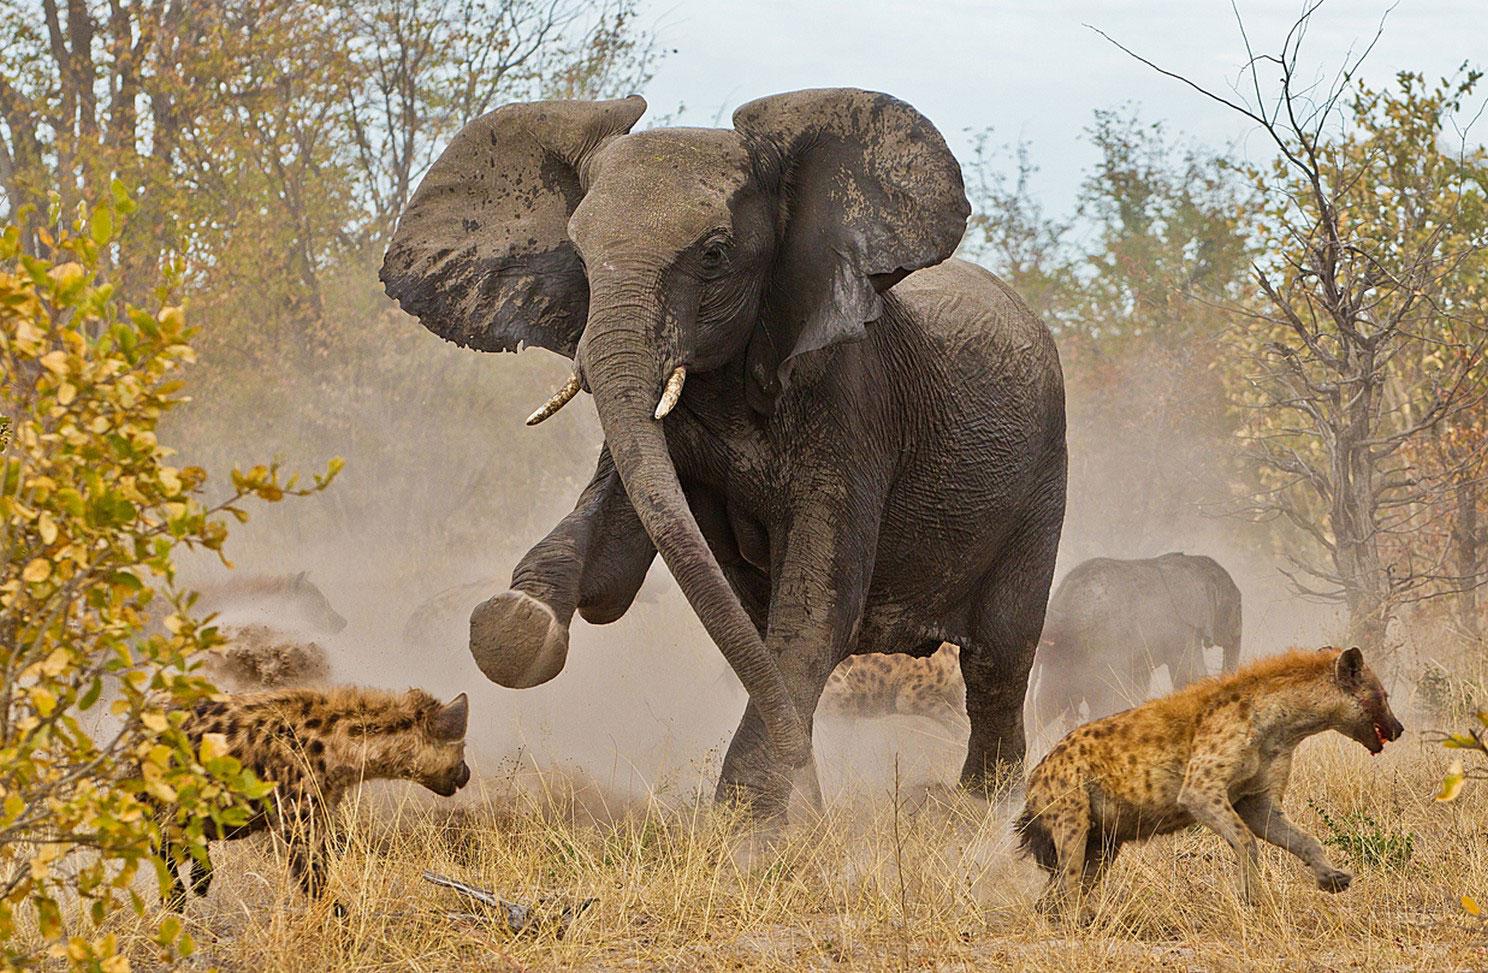 гиены напали на слоненка